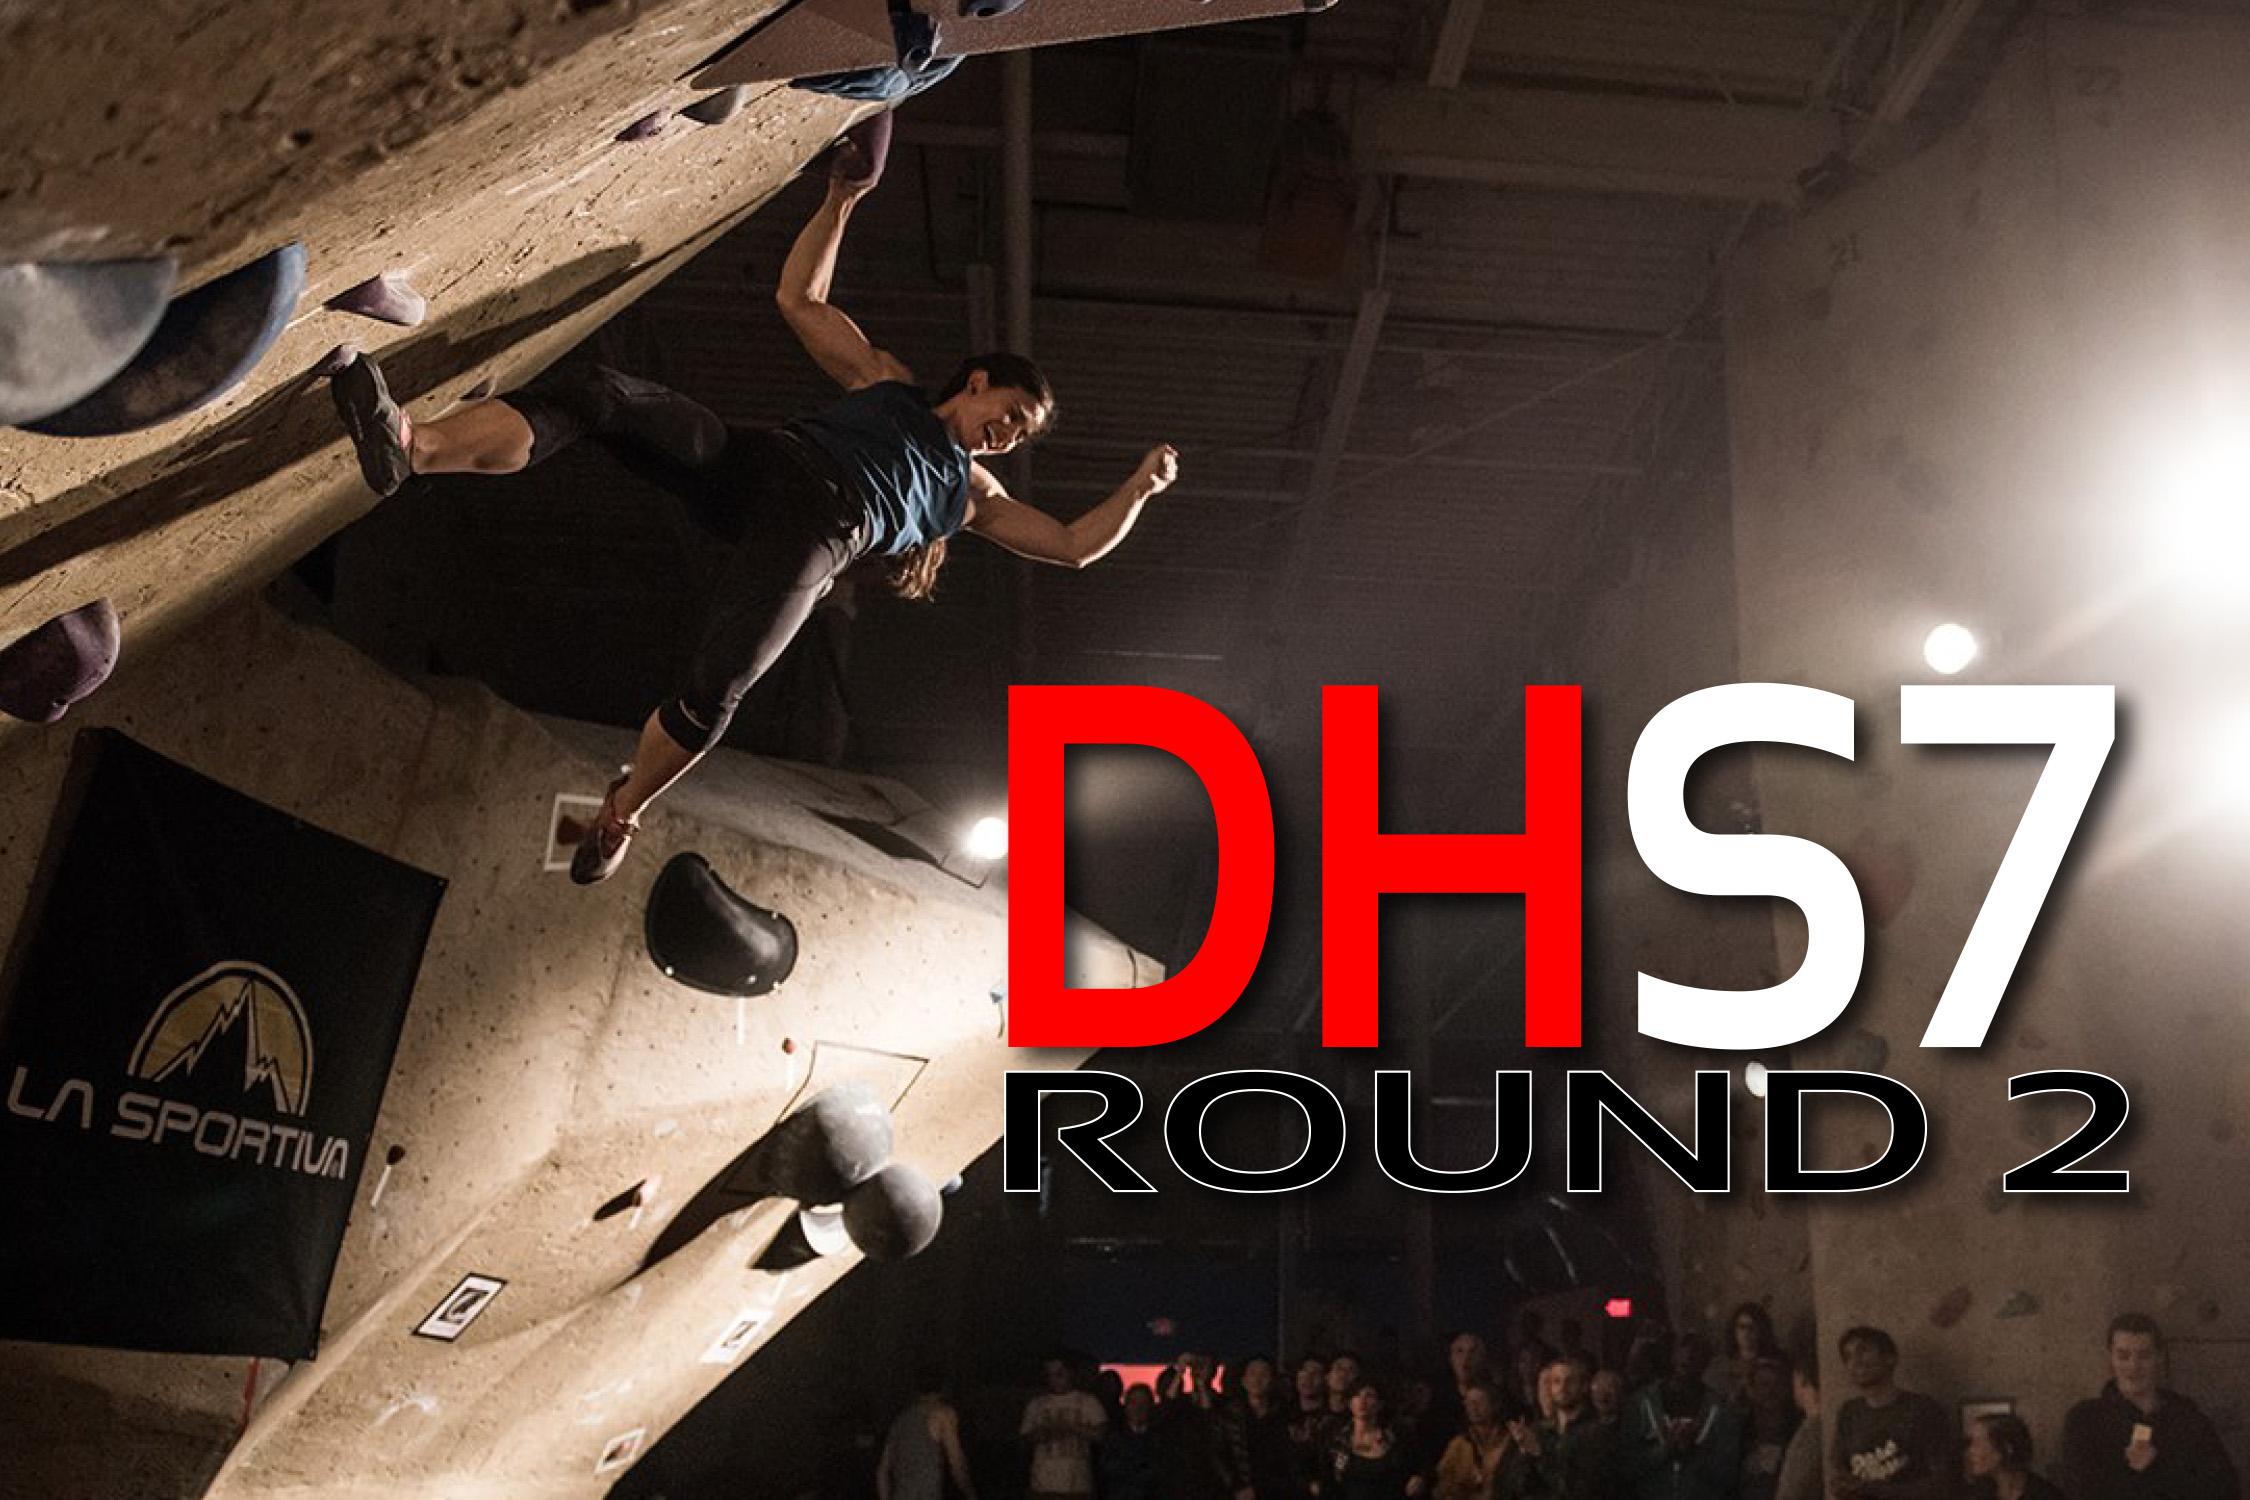 DHS7 - ROUND 2